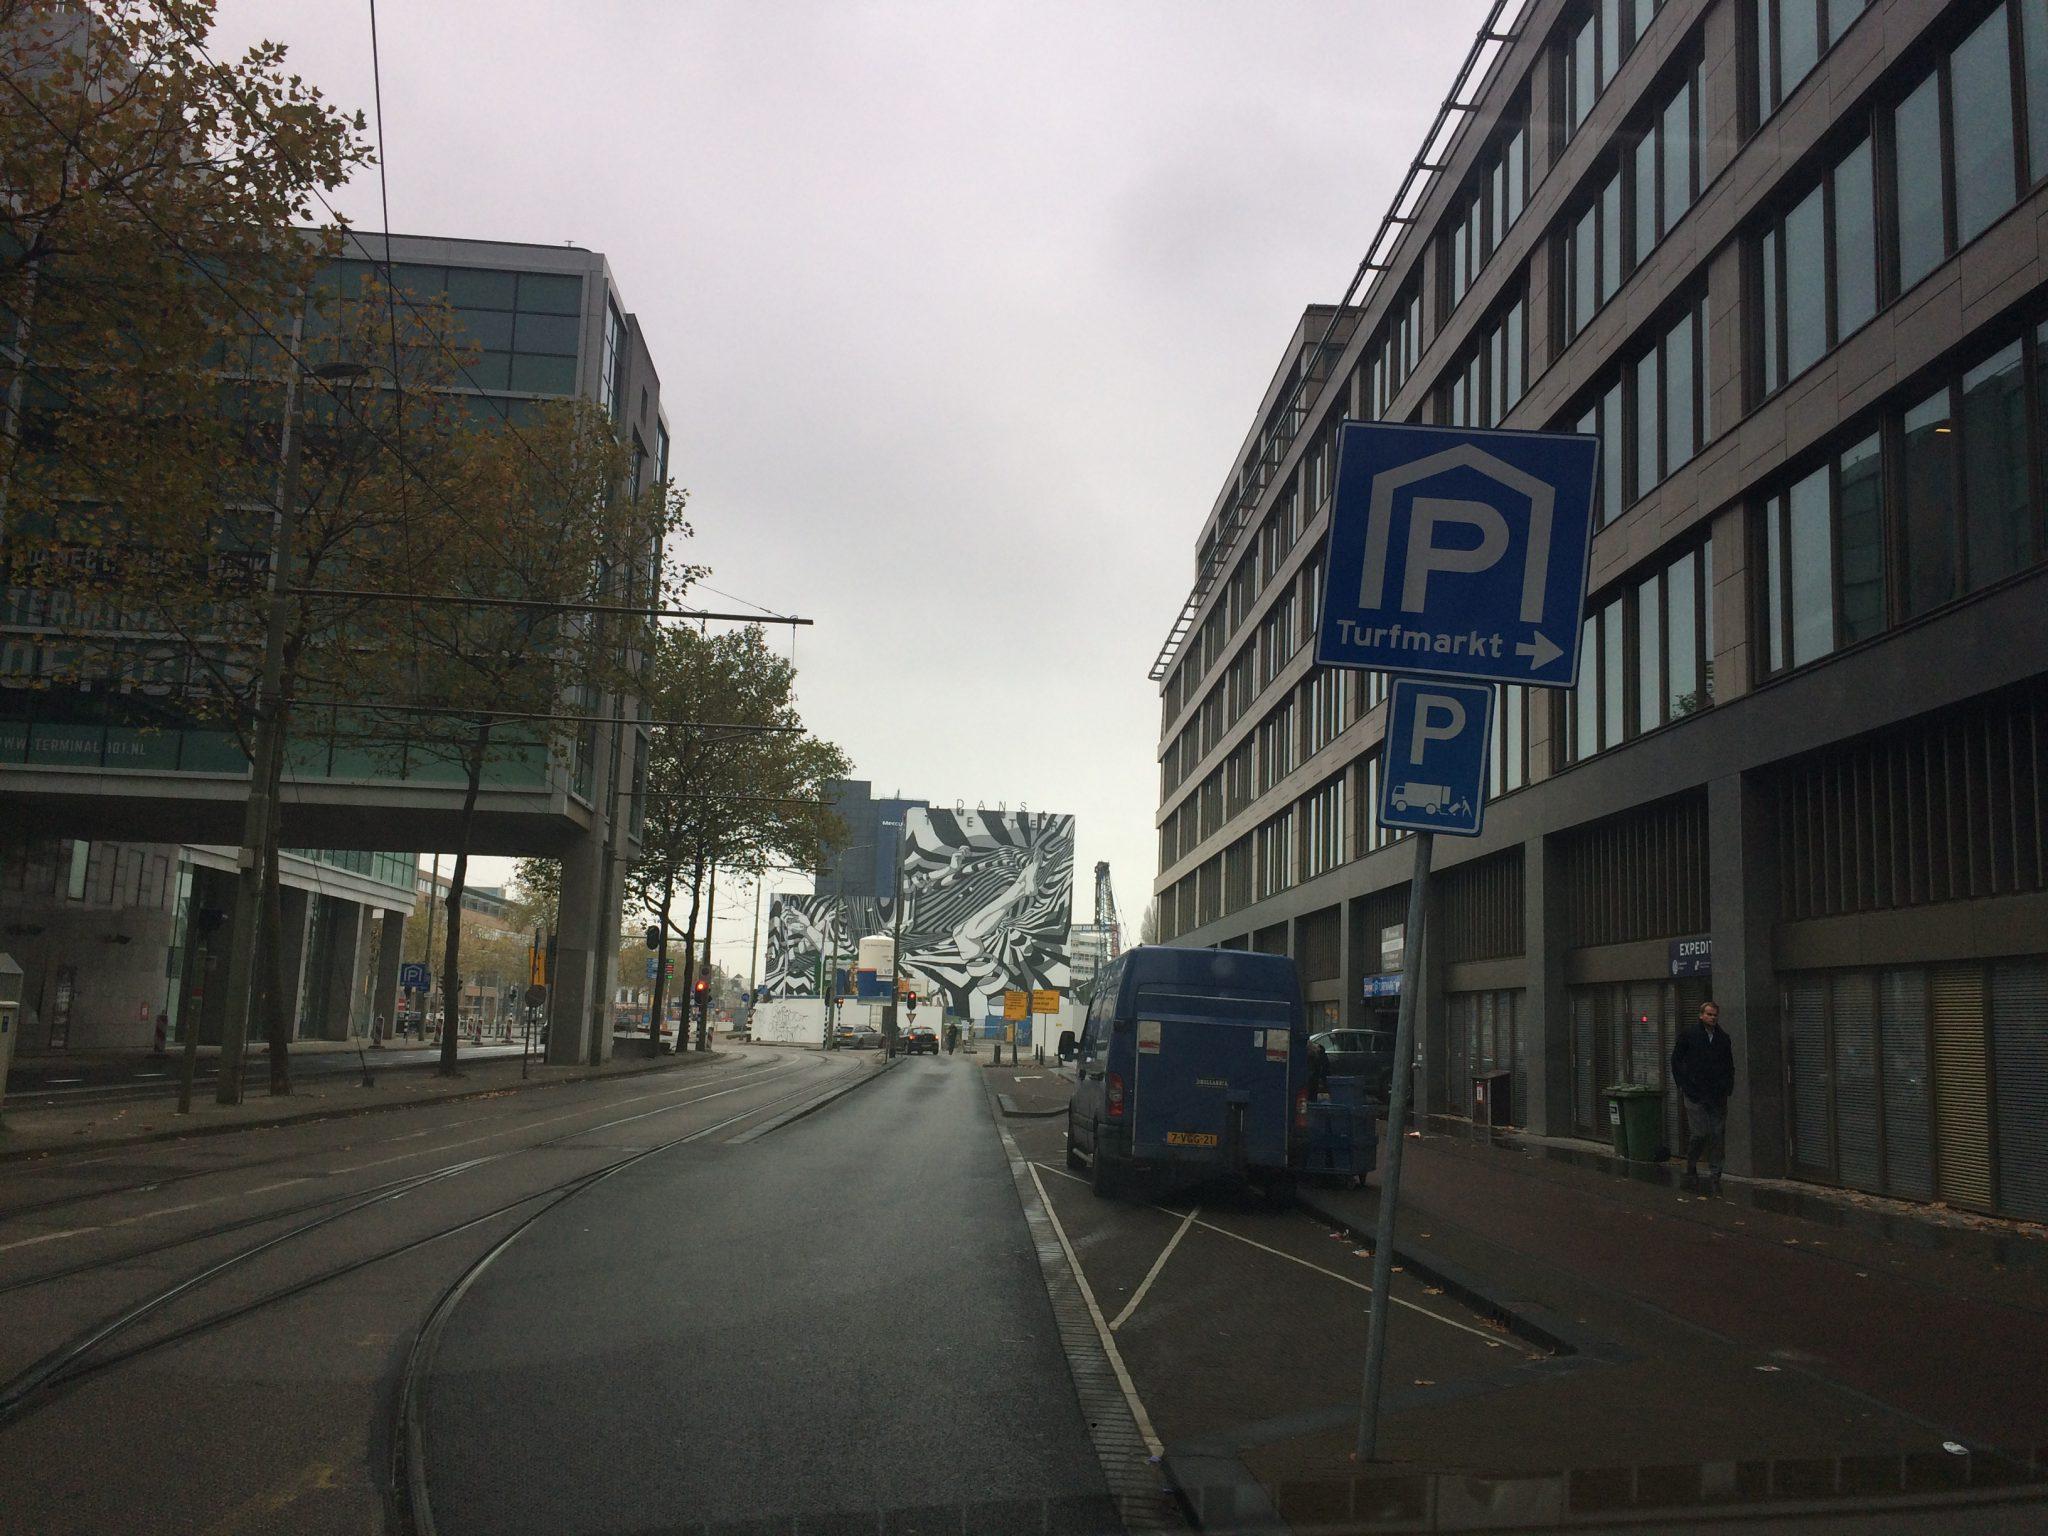 project-dry-works-parkeergarage-lekkage-vochtprobleem-den-haag